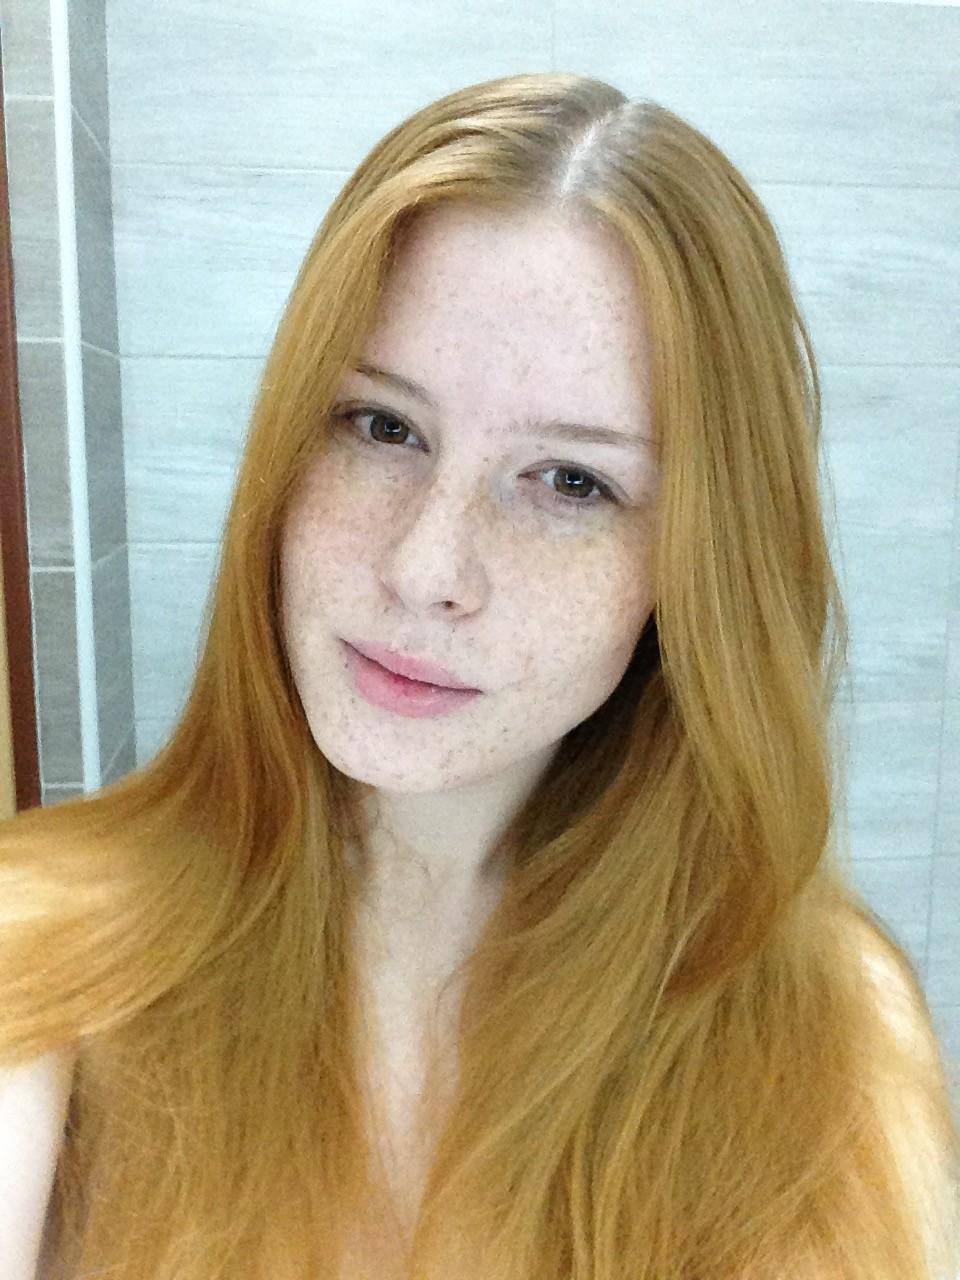 lenka Regalová , cityflower - redhead, cream skincare, freckles